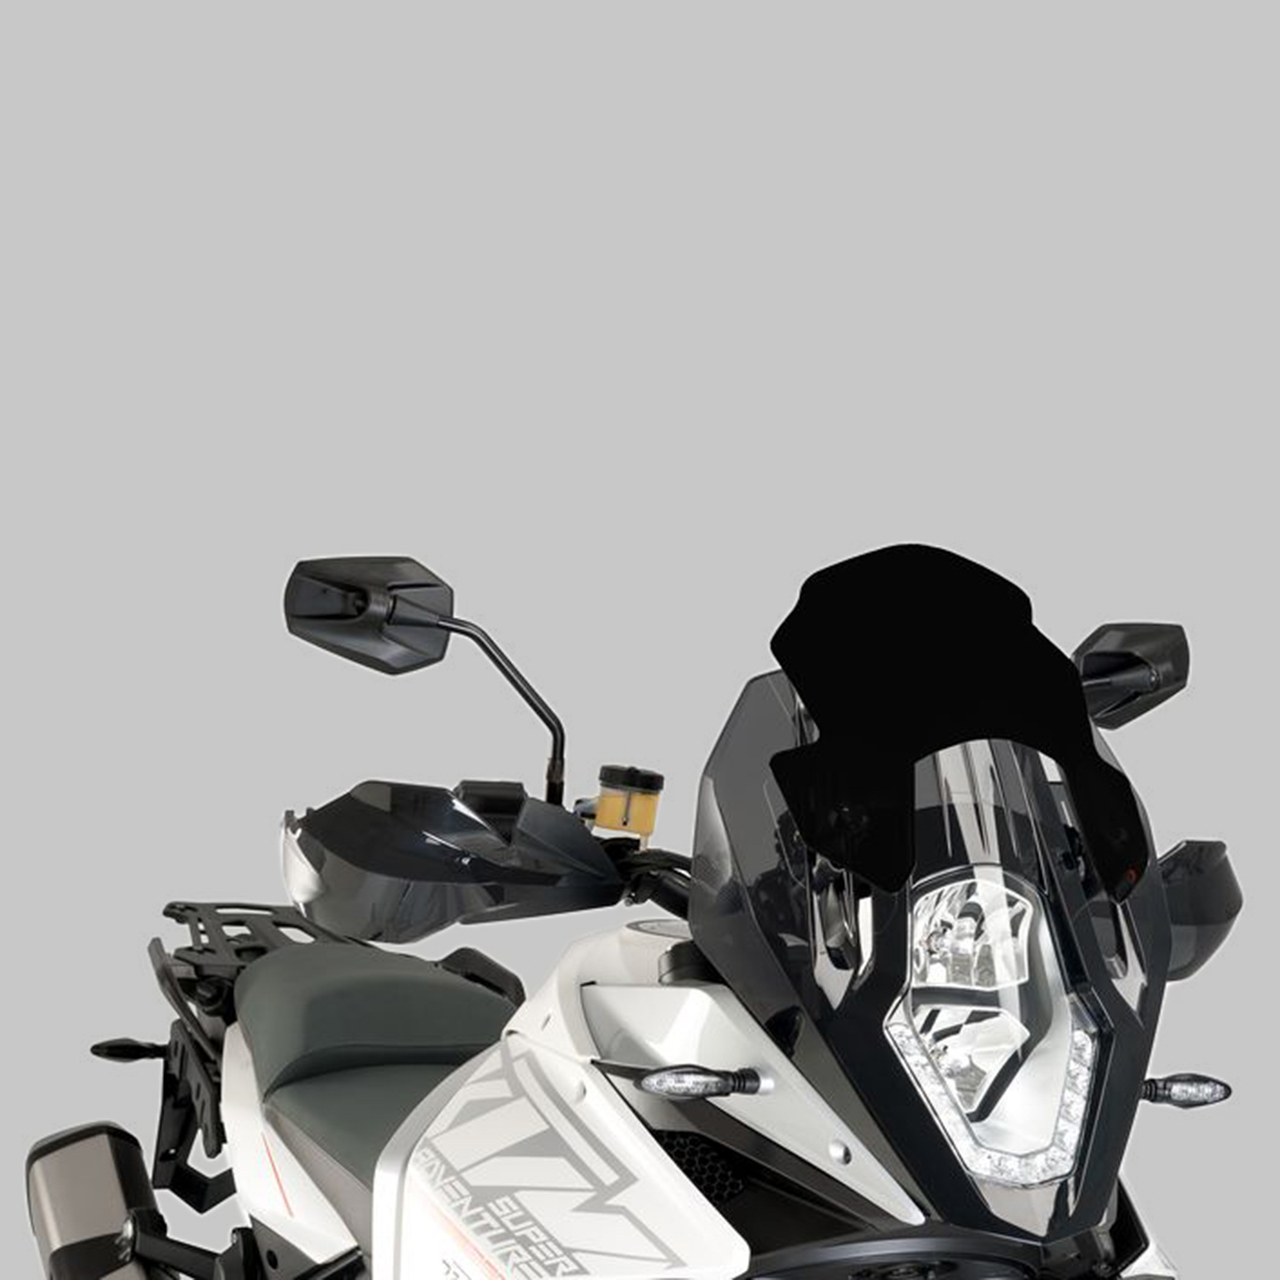 PUIG 6847N Racing Windscreen Black